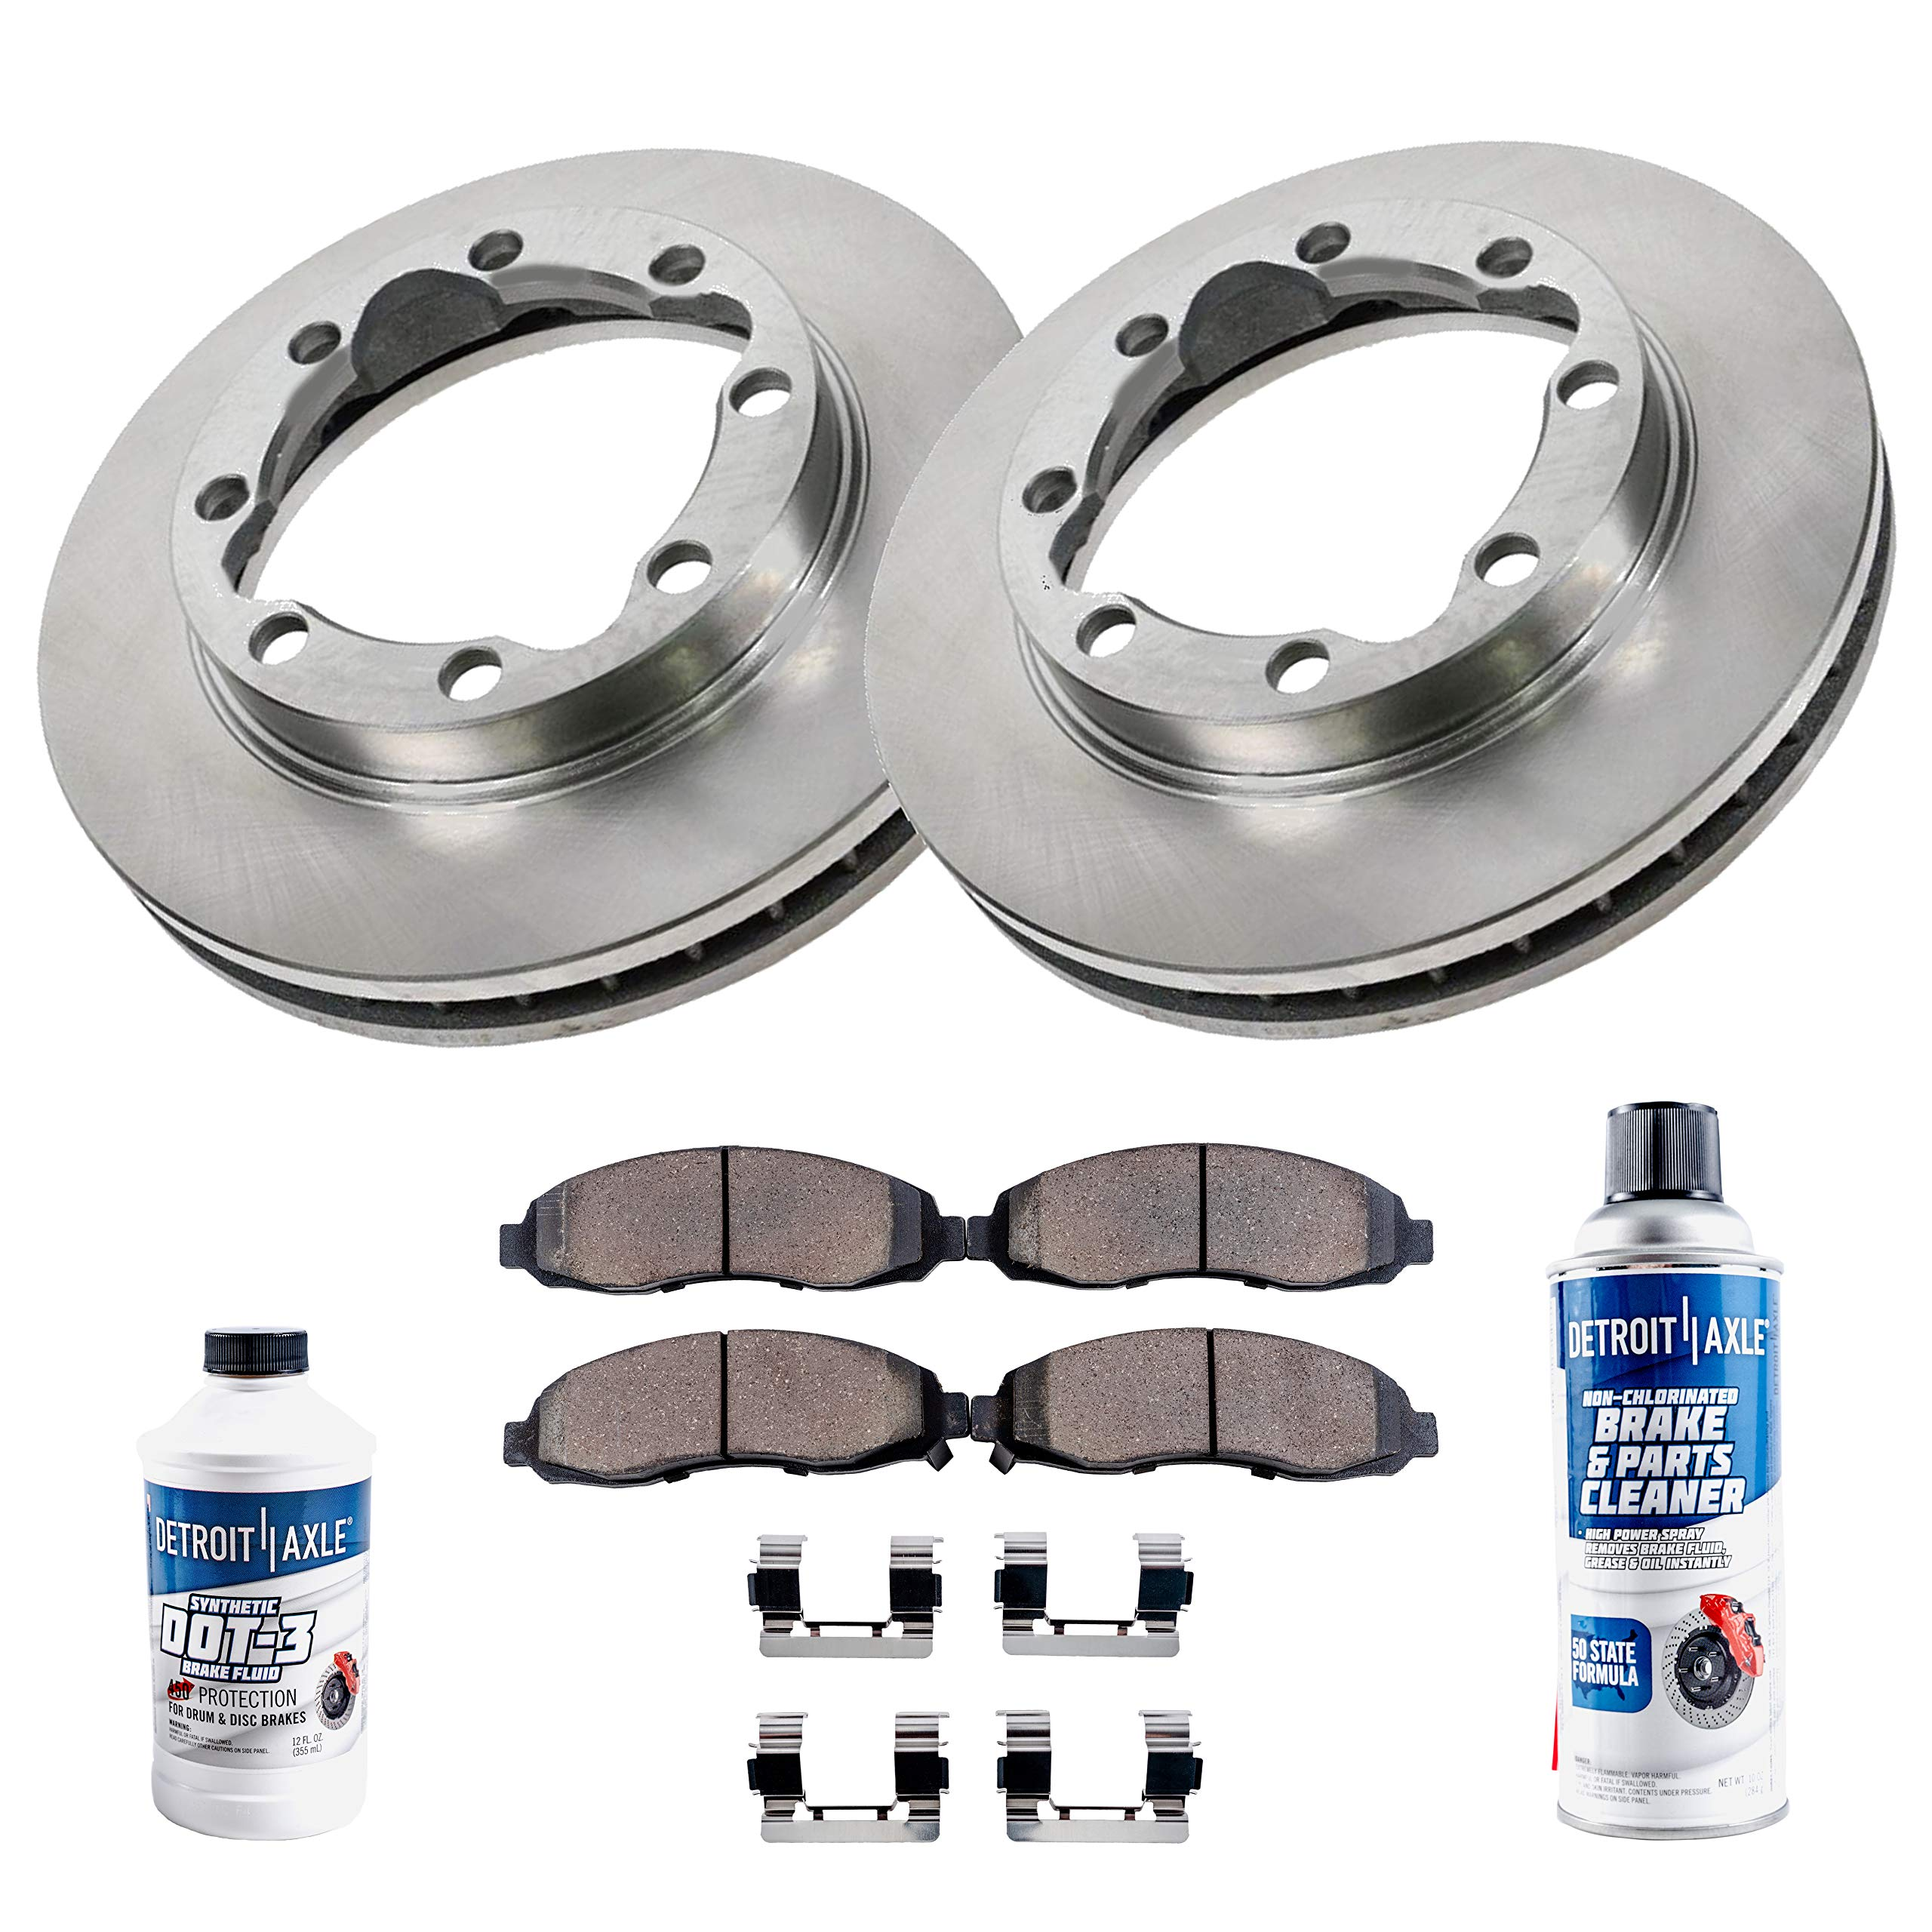 Detroit Axle - Complete FRONT Brake Rotors & Ceramic Brake